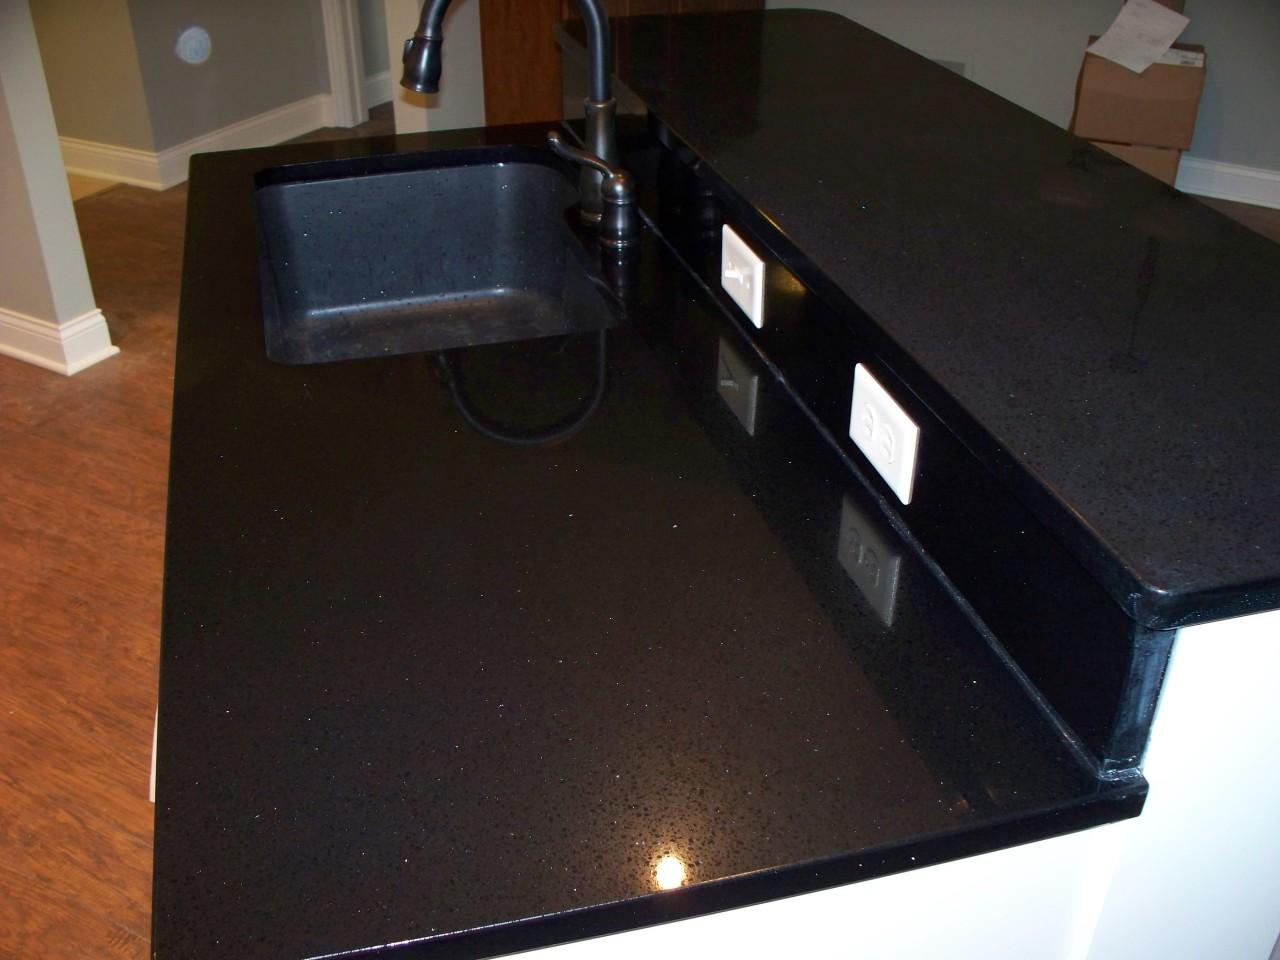 Black Quartz Countertops : Scratches repaired on black night quartz countertop